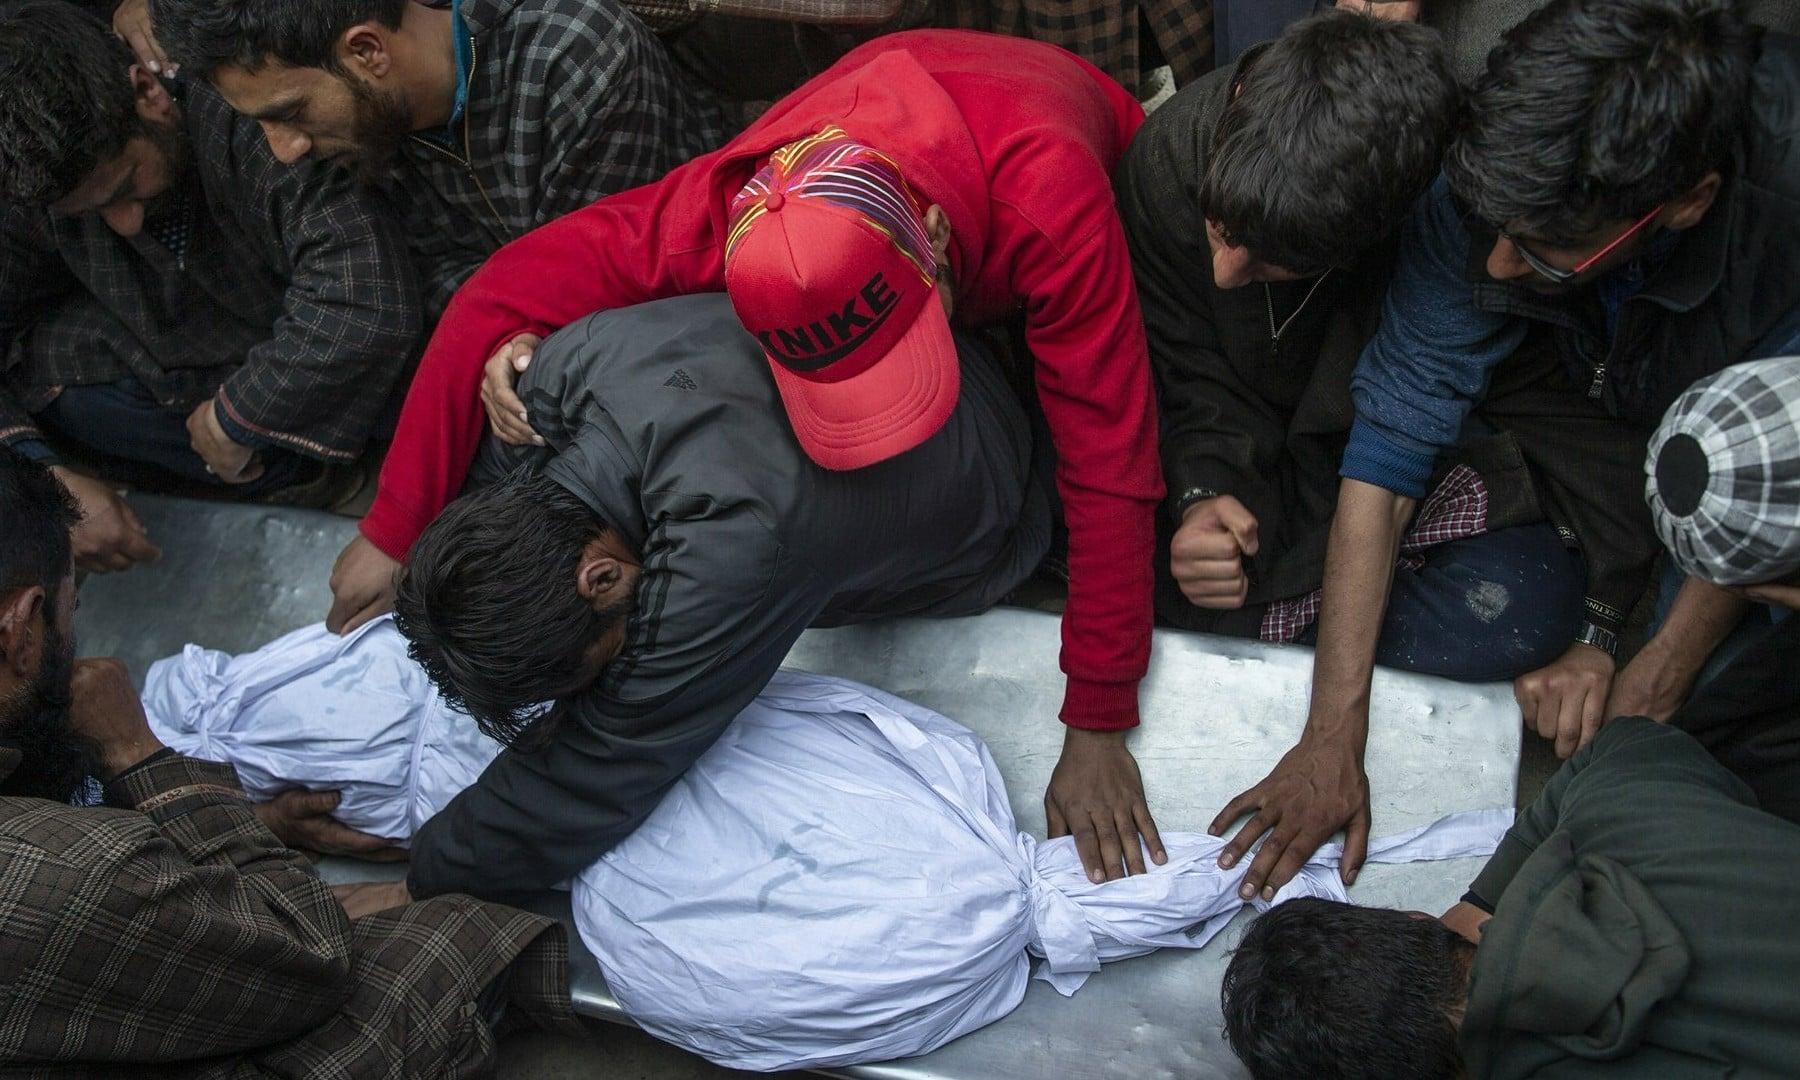 Kashmiri villagers grieve near the body of an 11-year-old boy, Aatif Mir, during his funeral procession in Hajin village on March 22, 2019. — AP/Dar Yasin